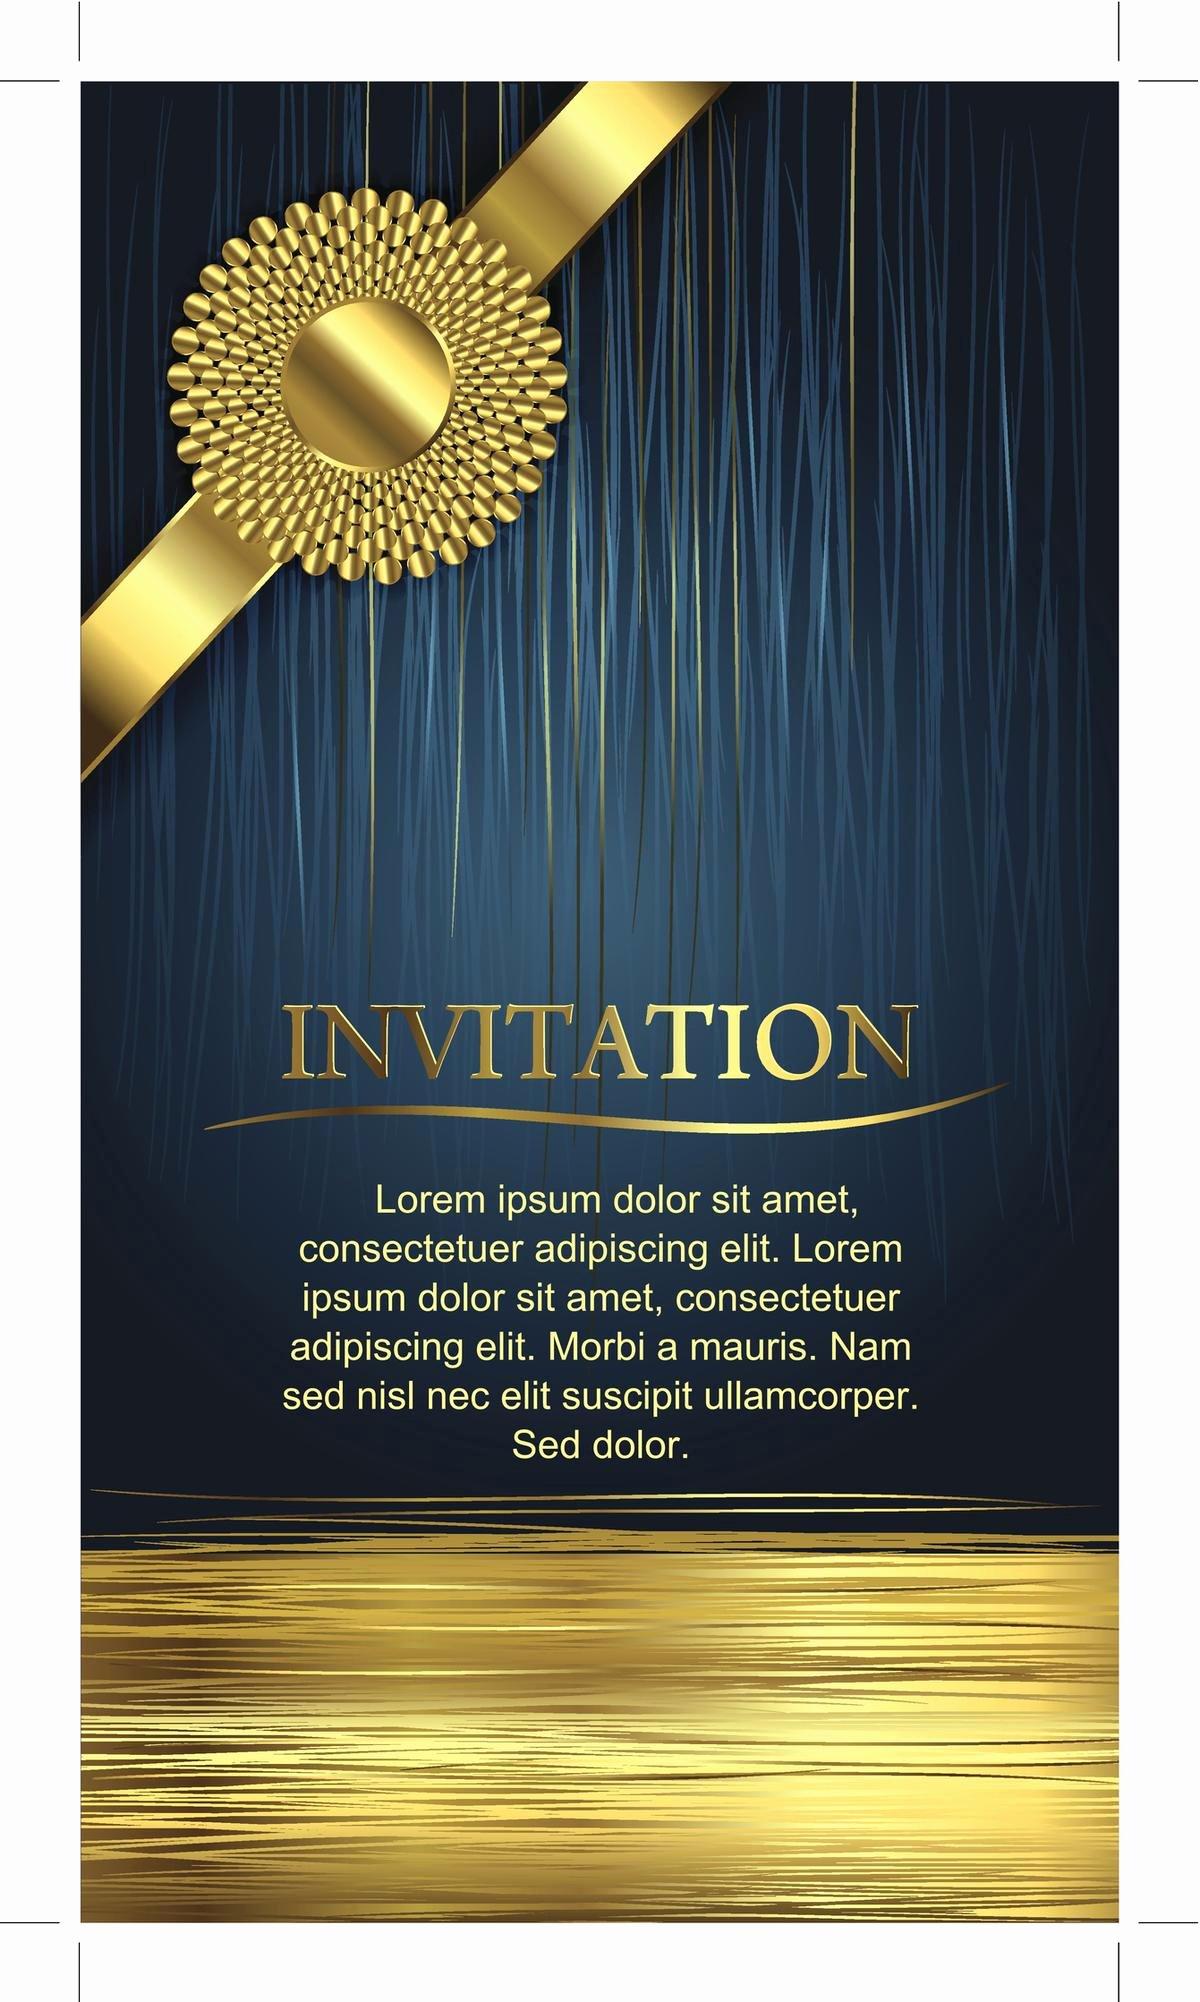 50th Birthday Invitation Wording Samples Fresh Graciously Invite People Birthday Invitation Wording Samples